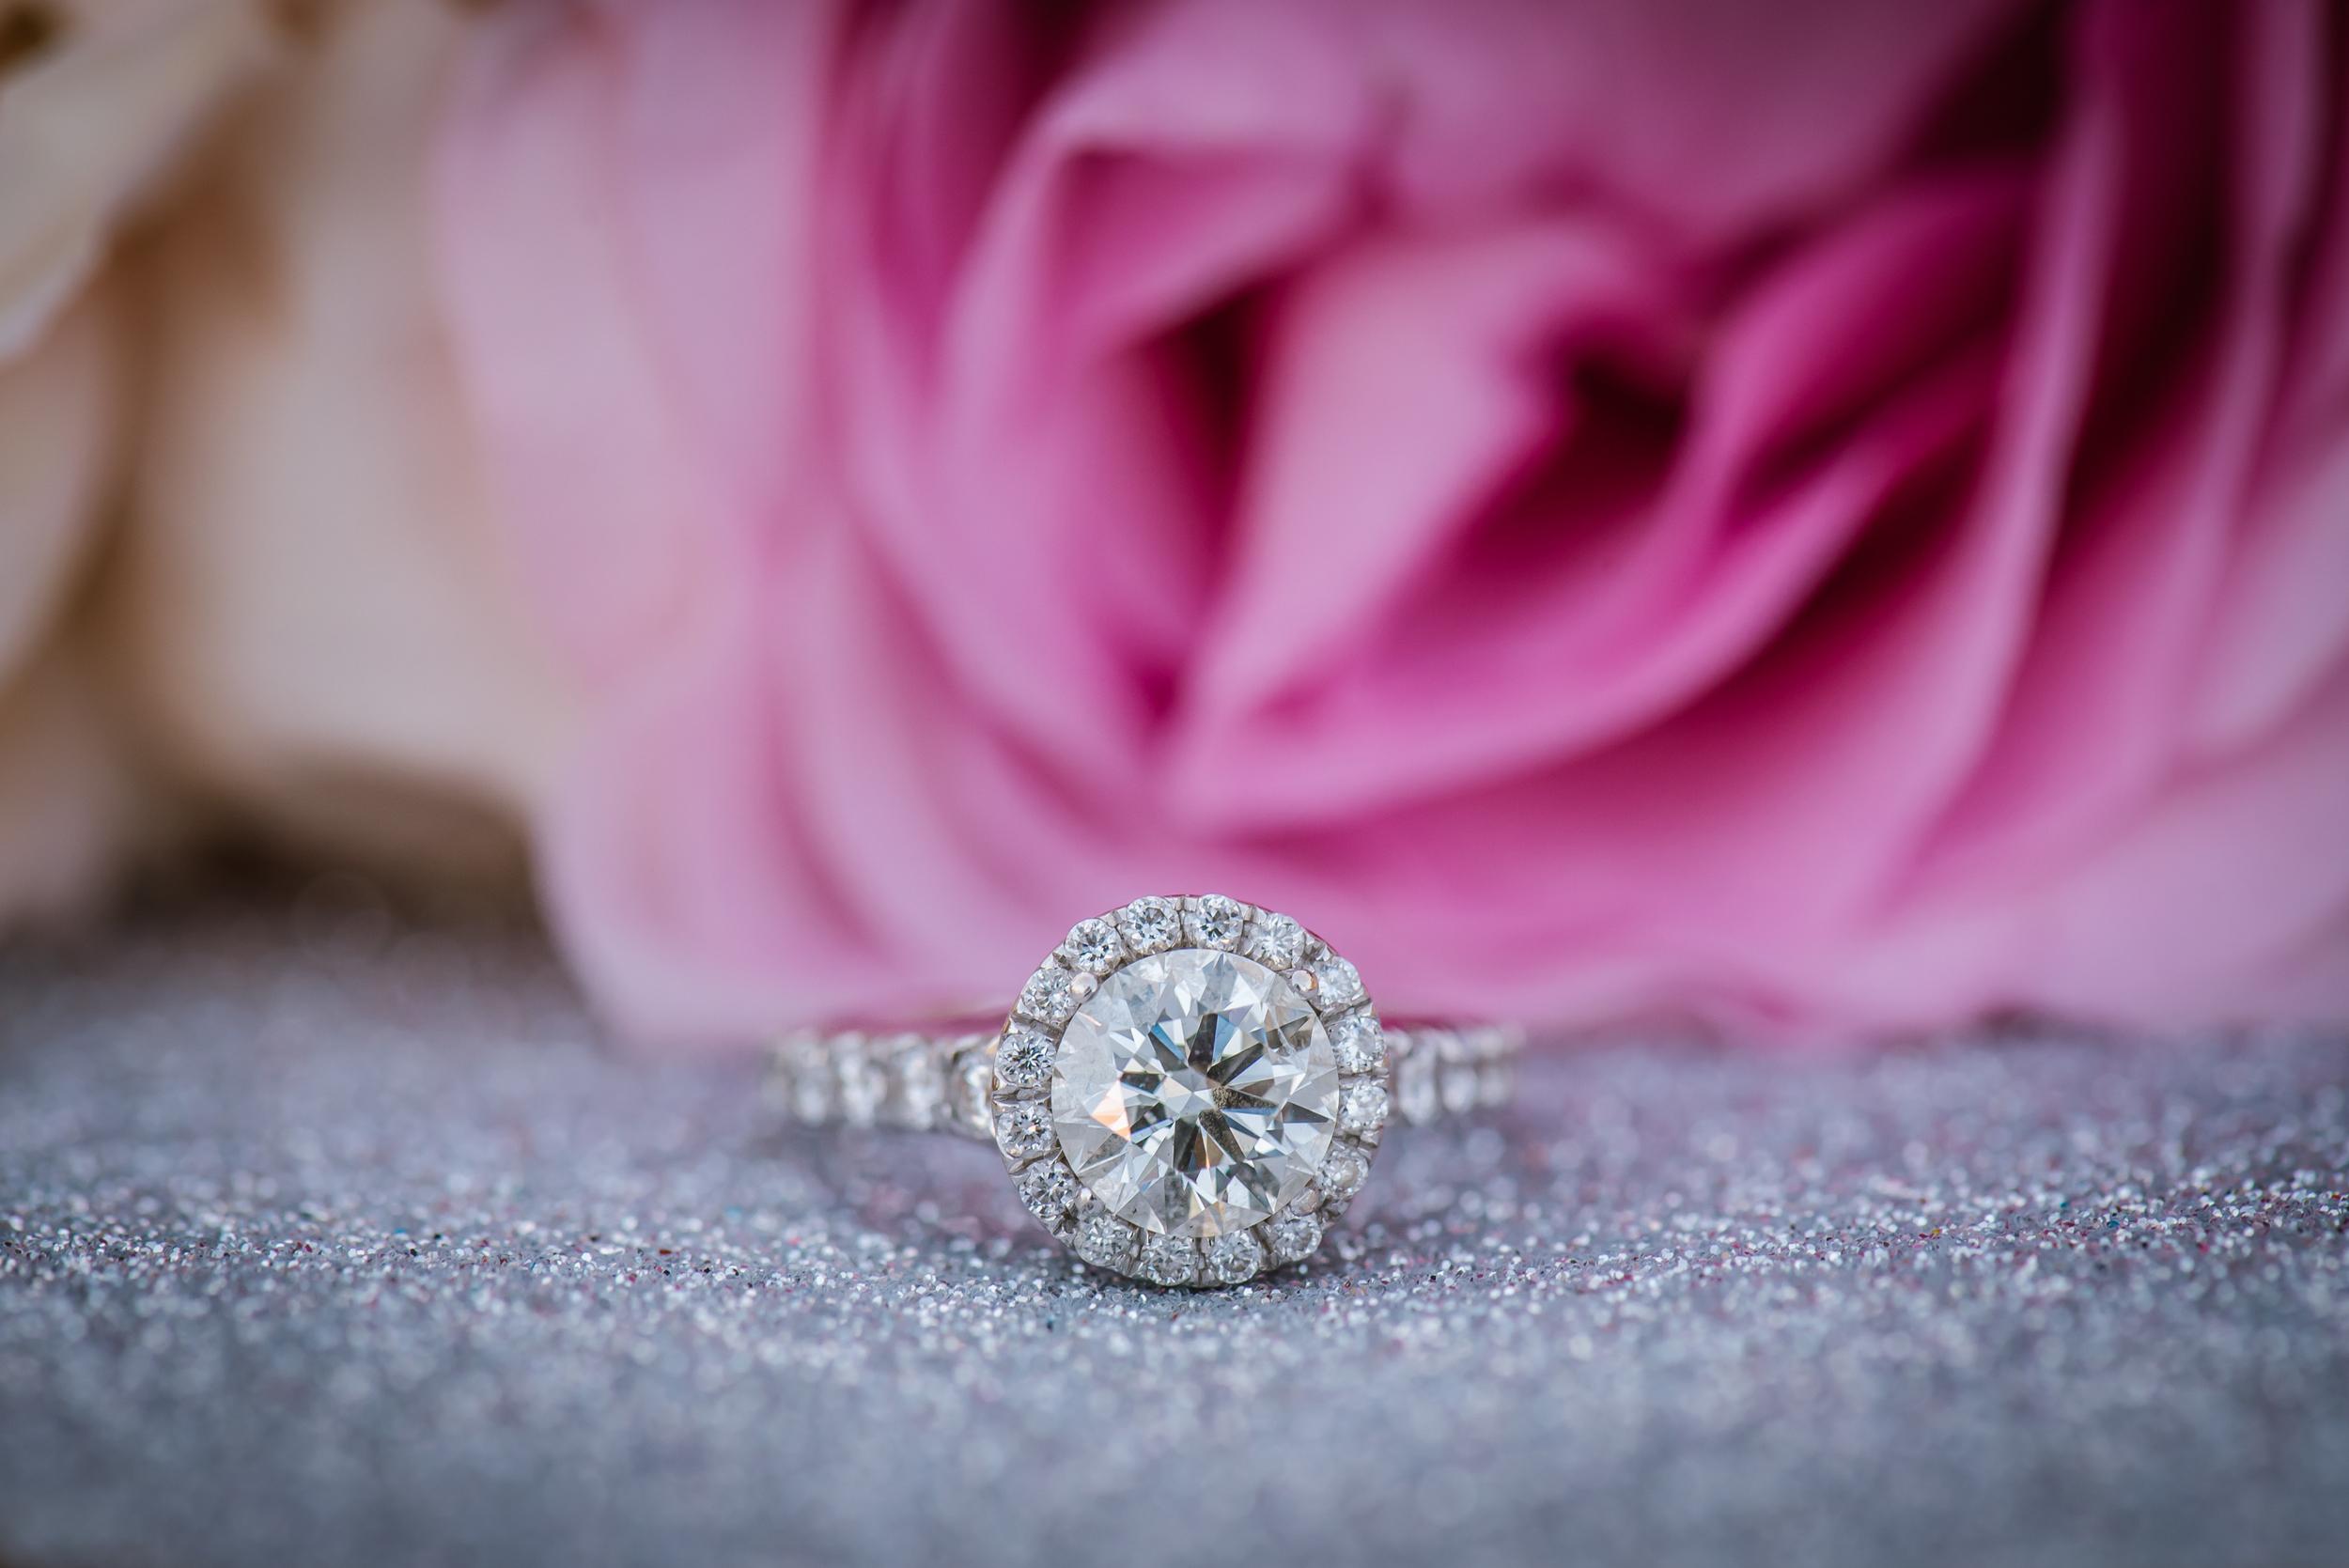 tampa-engagement-photographer-pink-diamond-closeup-macro-ring-shot